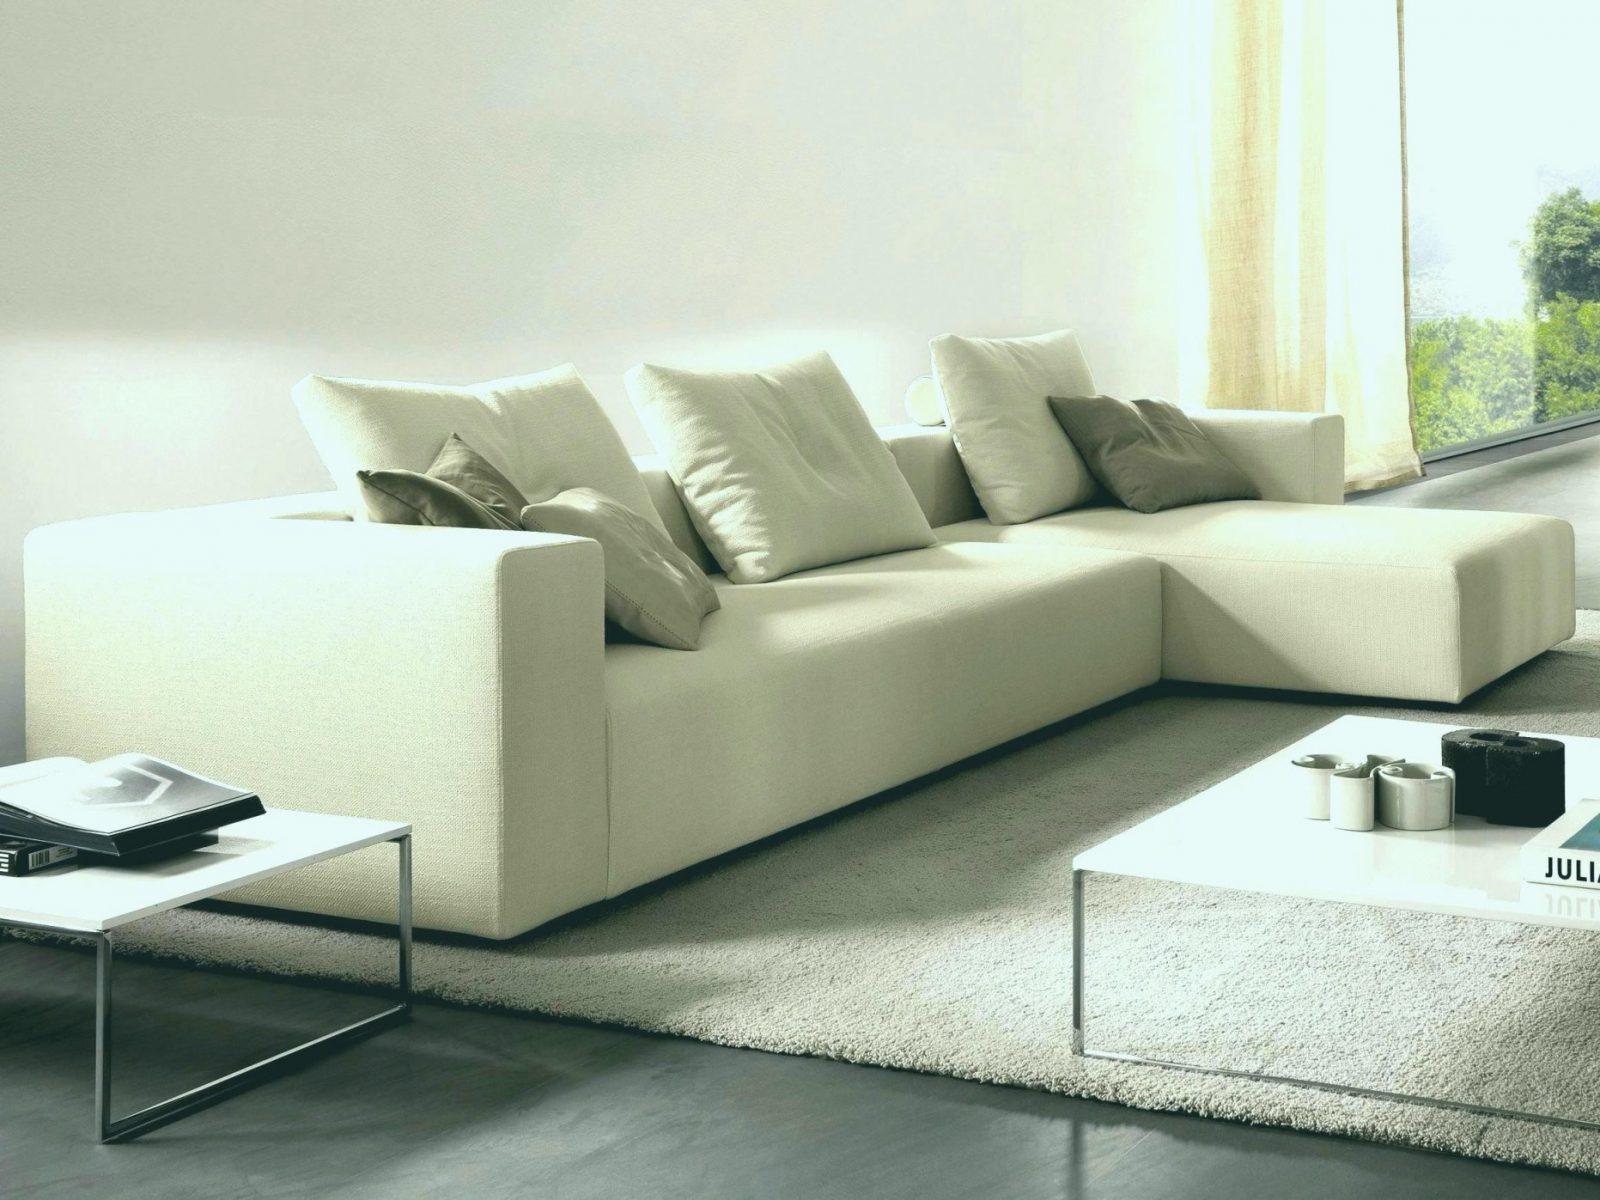 Sofa Bezug Ecksofa Mit Ottomane  Zeitfuermama von Hussen Für Ecksofa Mit Ottomane Bild